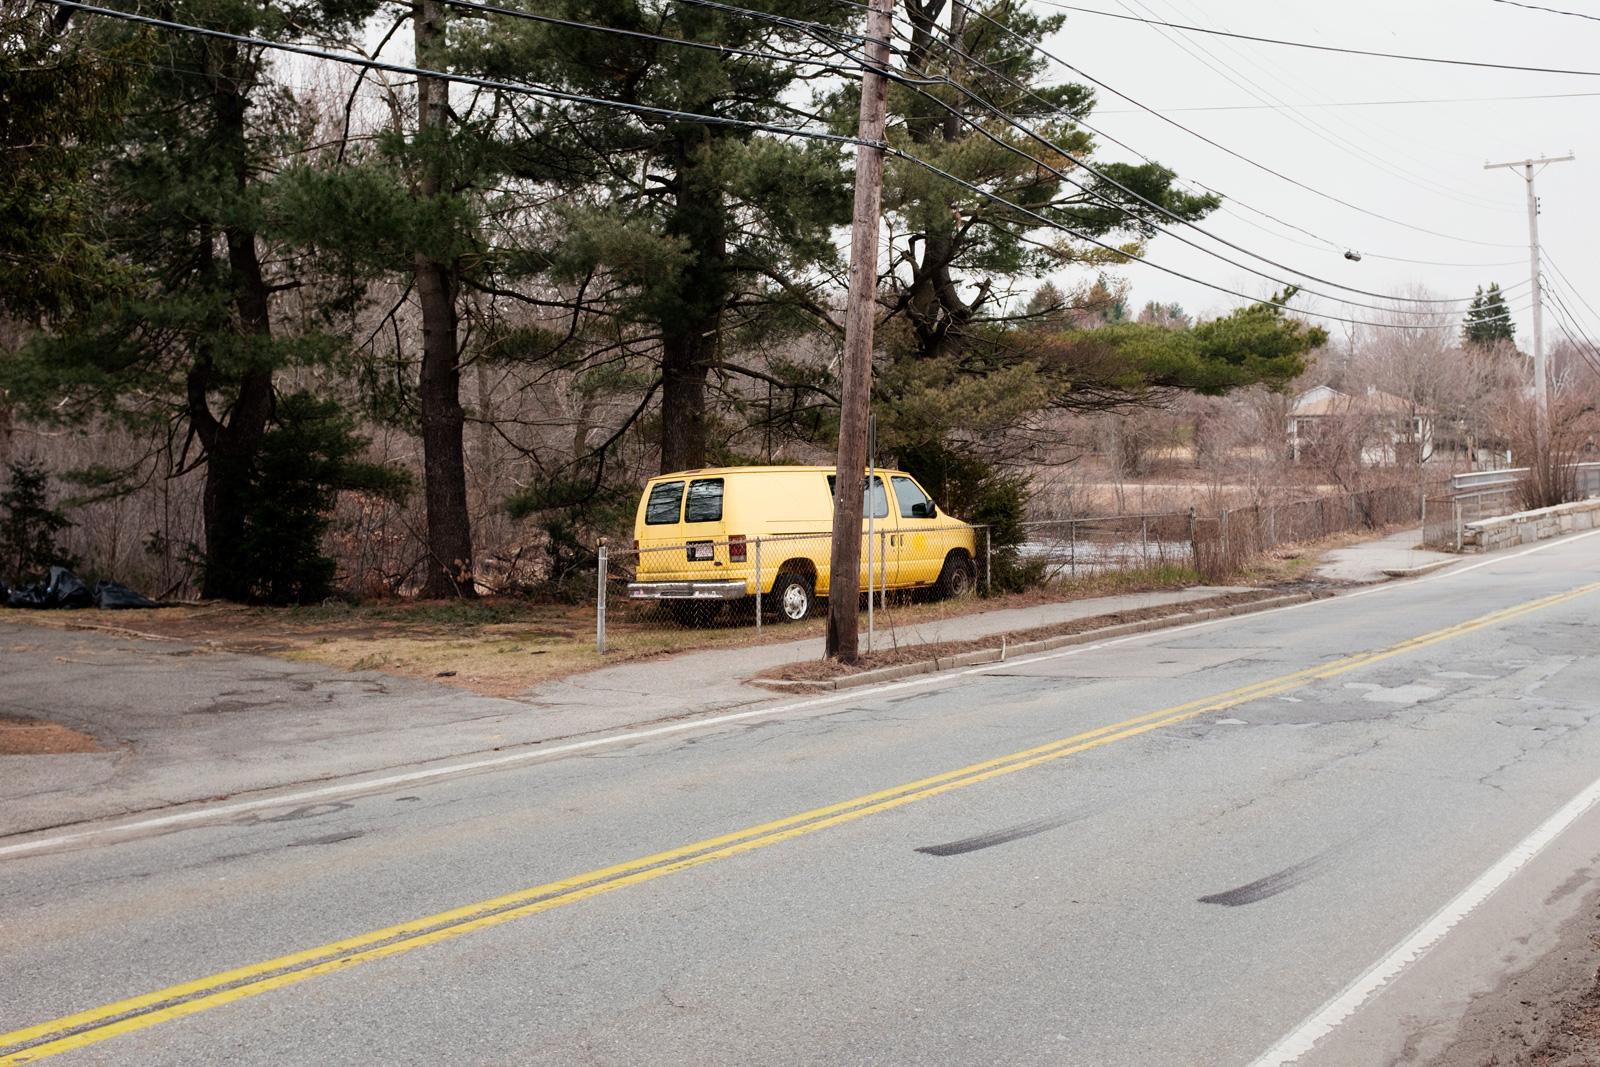 yellowvan.jpg